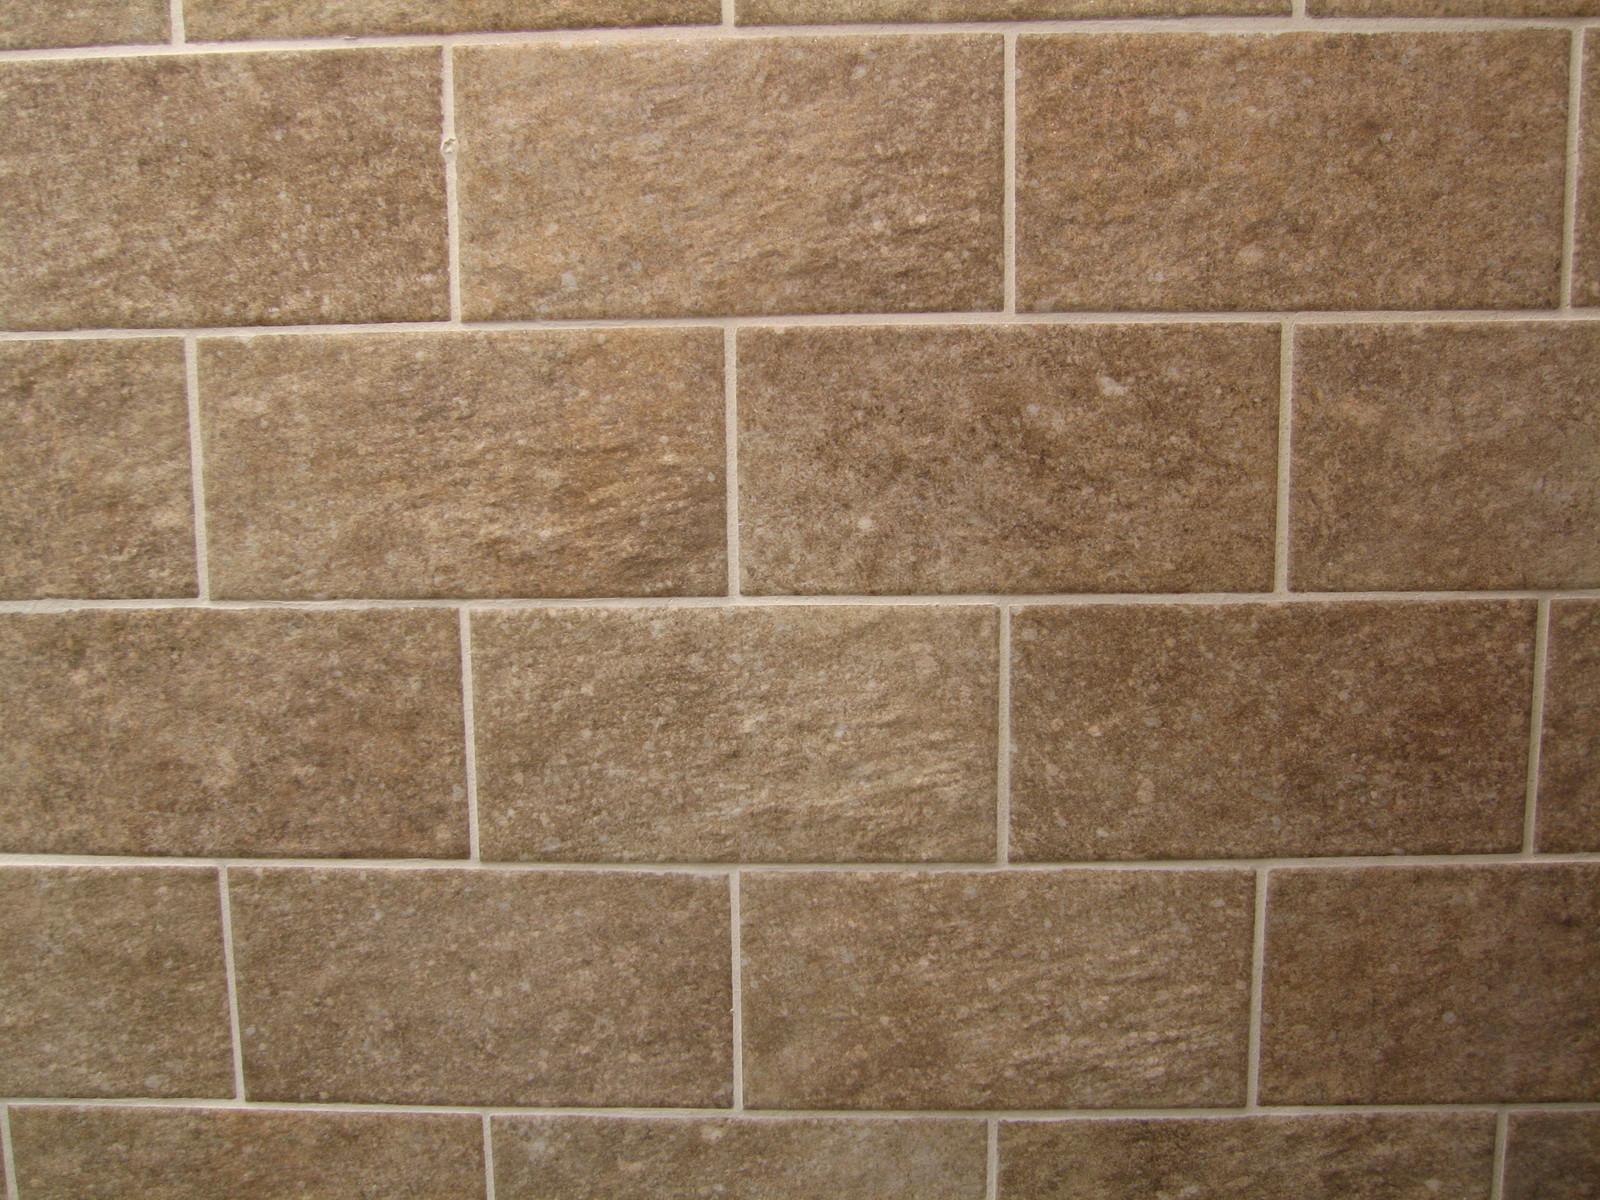 Bexley Glazed Ceramic Wall Tiles DIY Bathroom Kitchen. Bexley Glazed Ceramic Wall Tiles DIY Bathroom Kitchen Sample   eBay